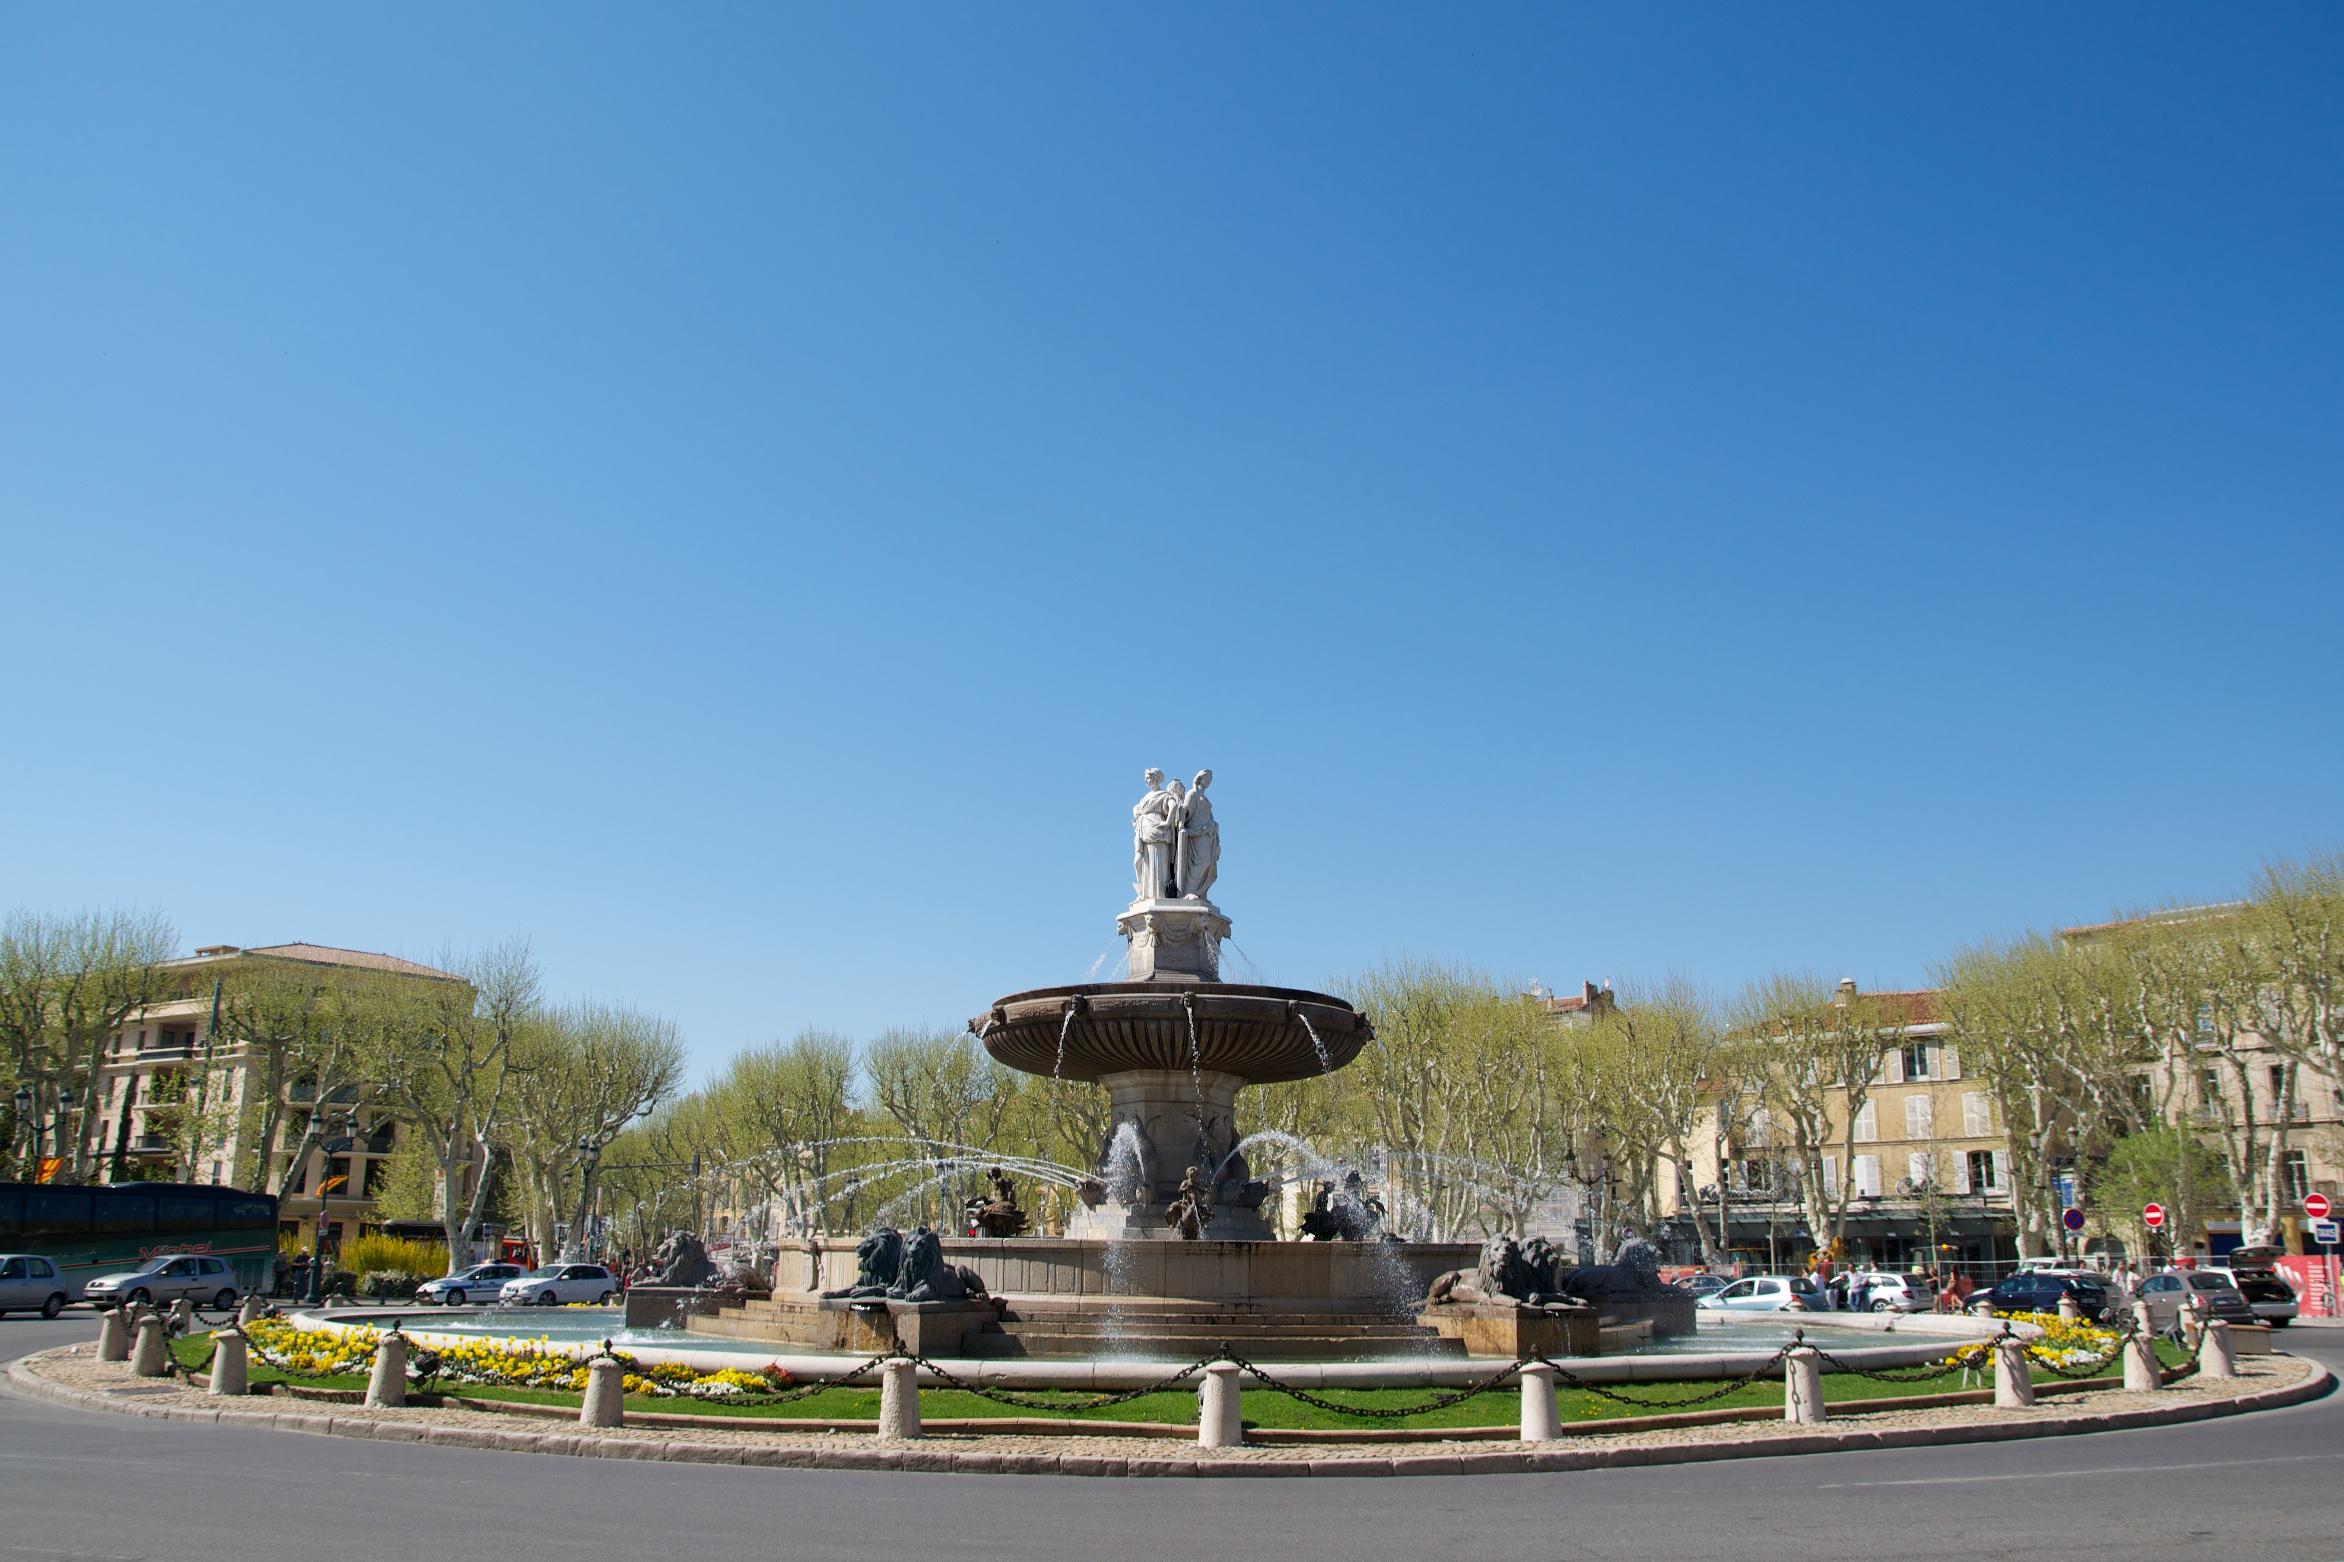 Marseille and Aix-en-Provence - Savannah Page 15